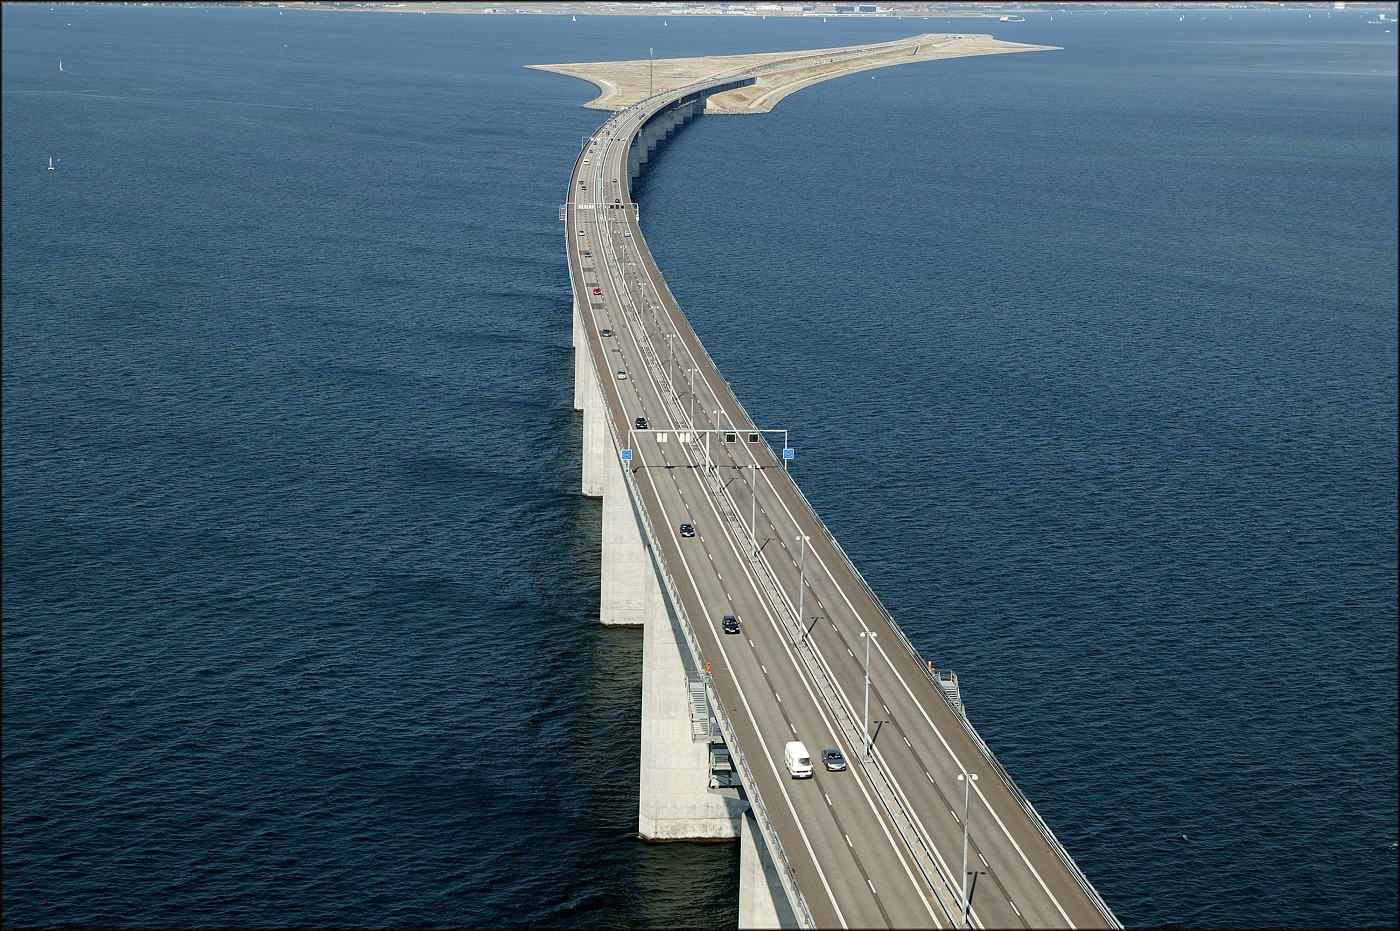 Podul Oresund, o construcție uimitoare!